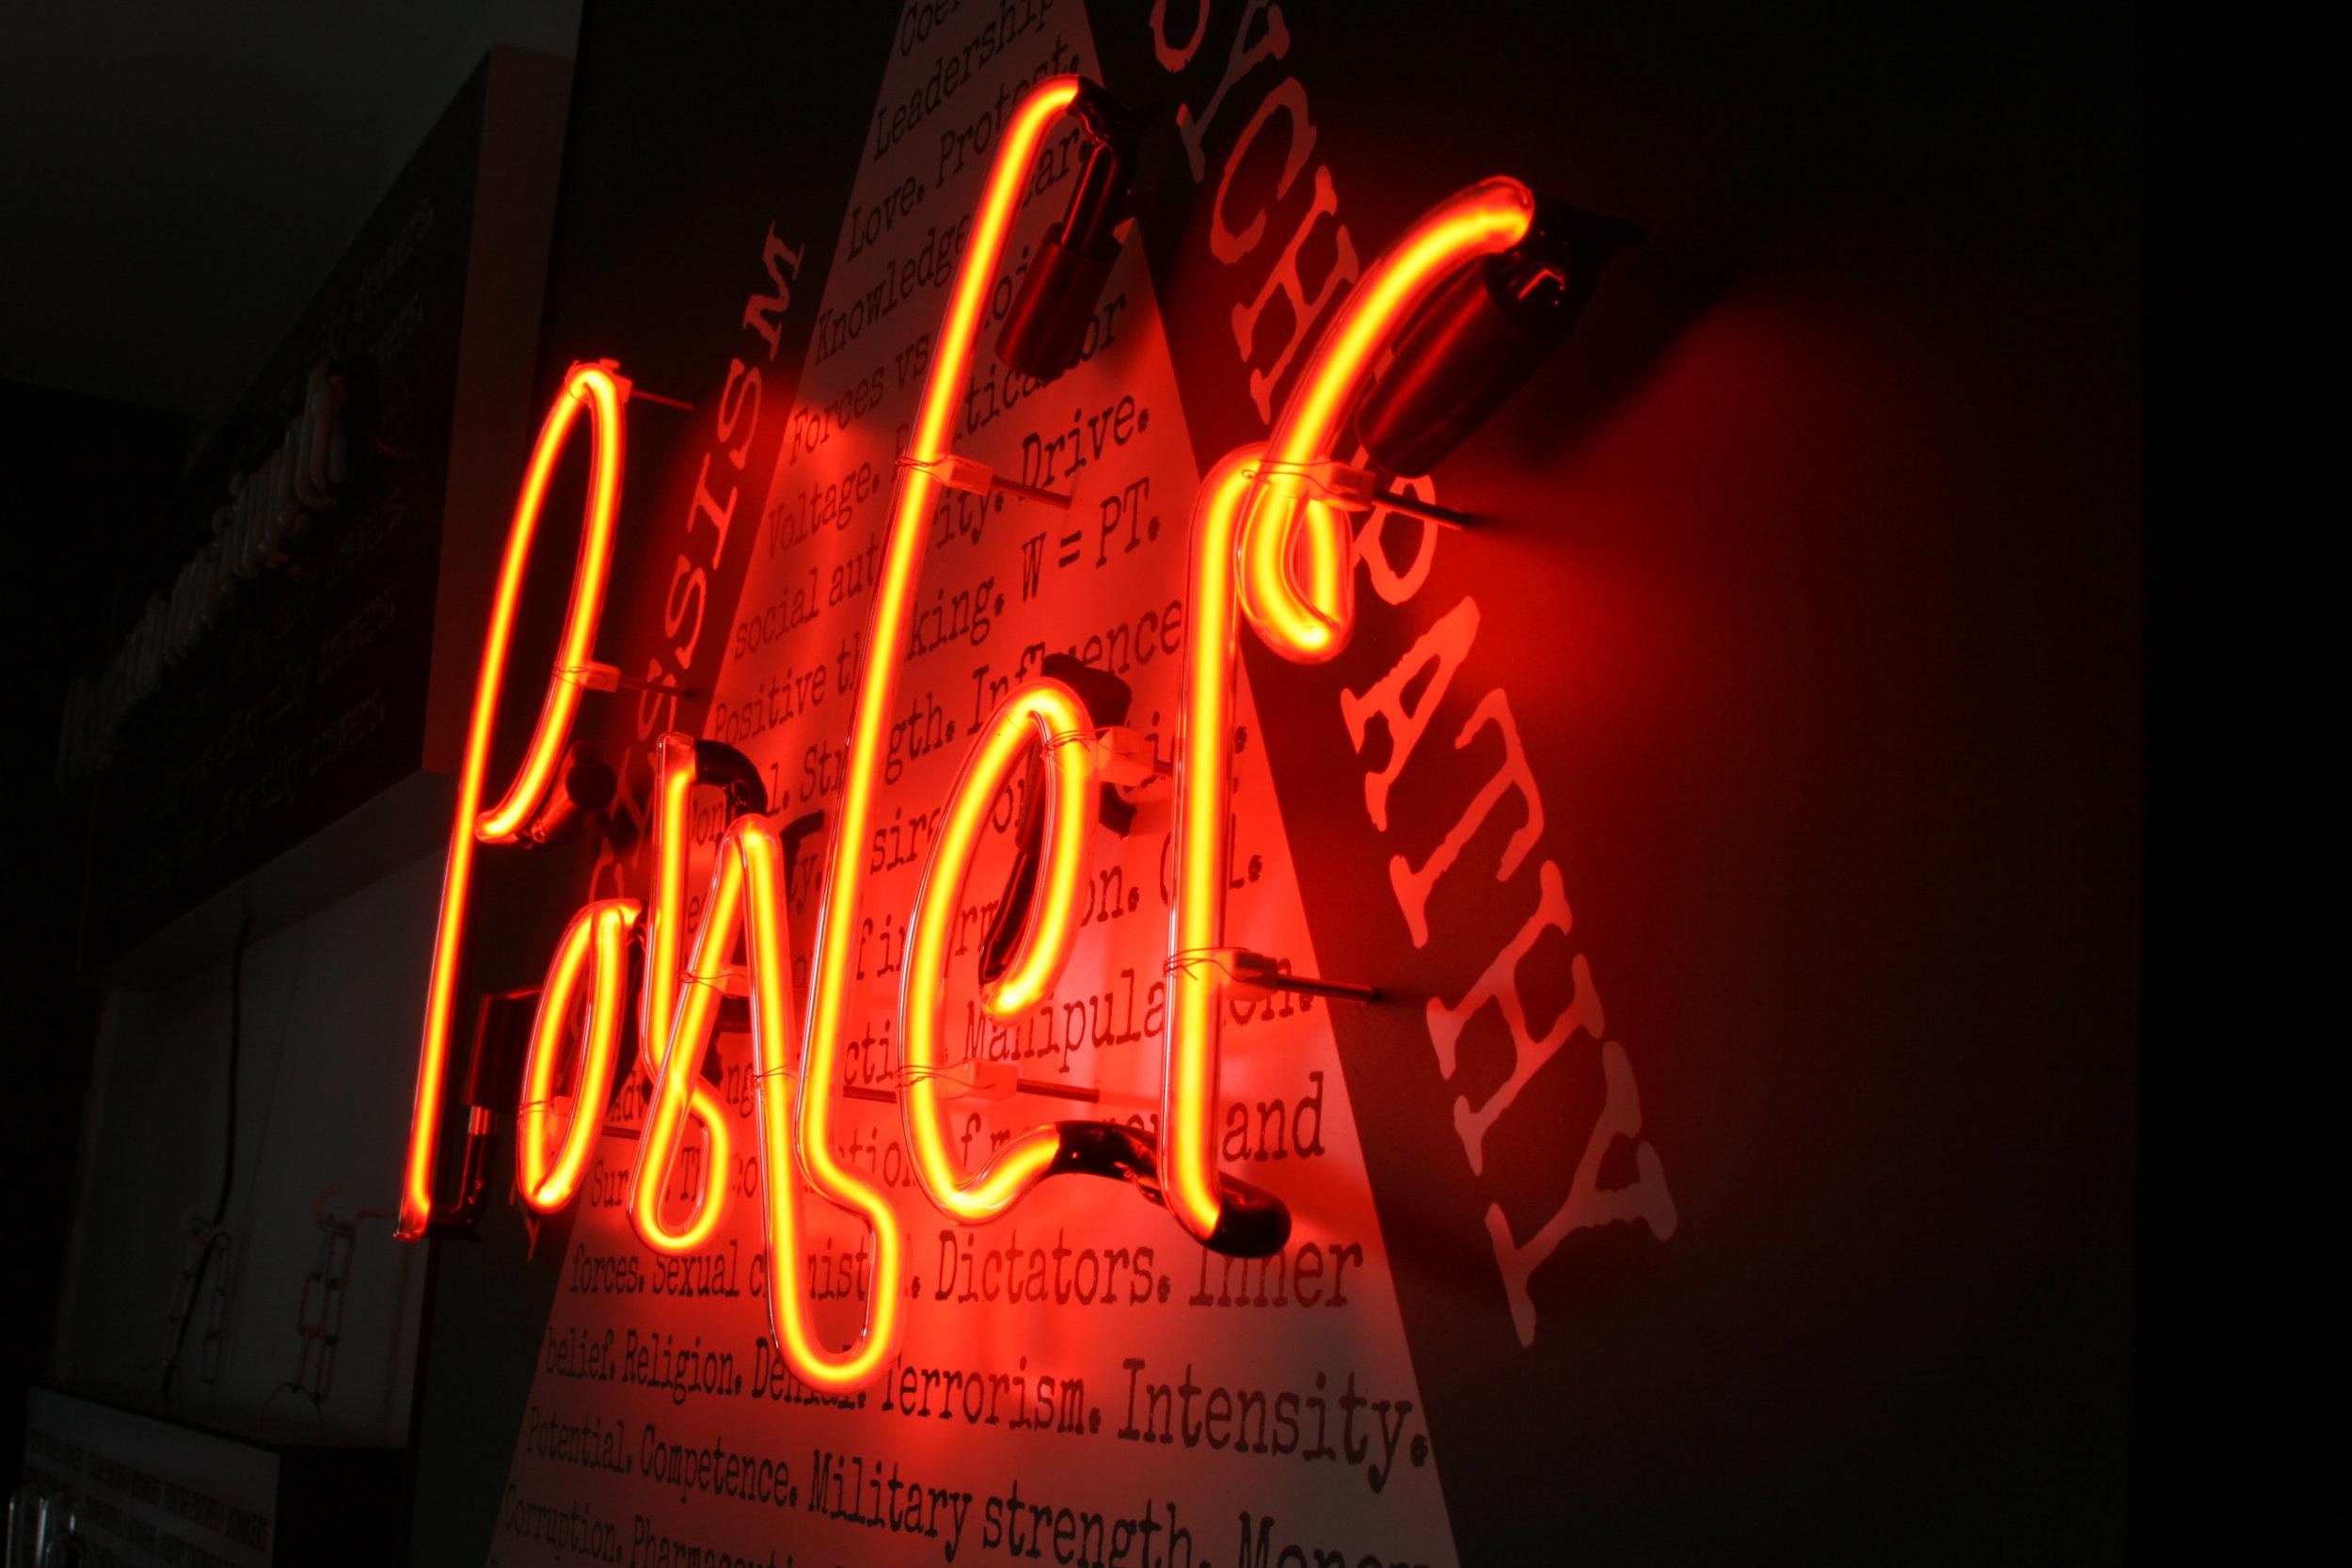 share lighting img light for signs led lights listing ltd sale shop pvt board neon